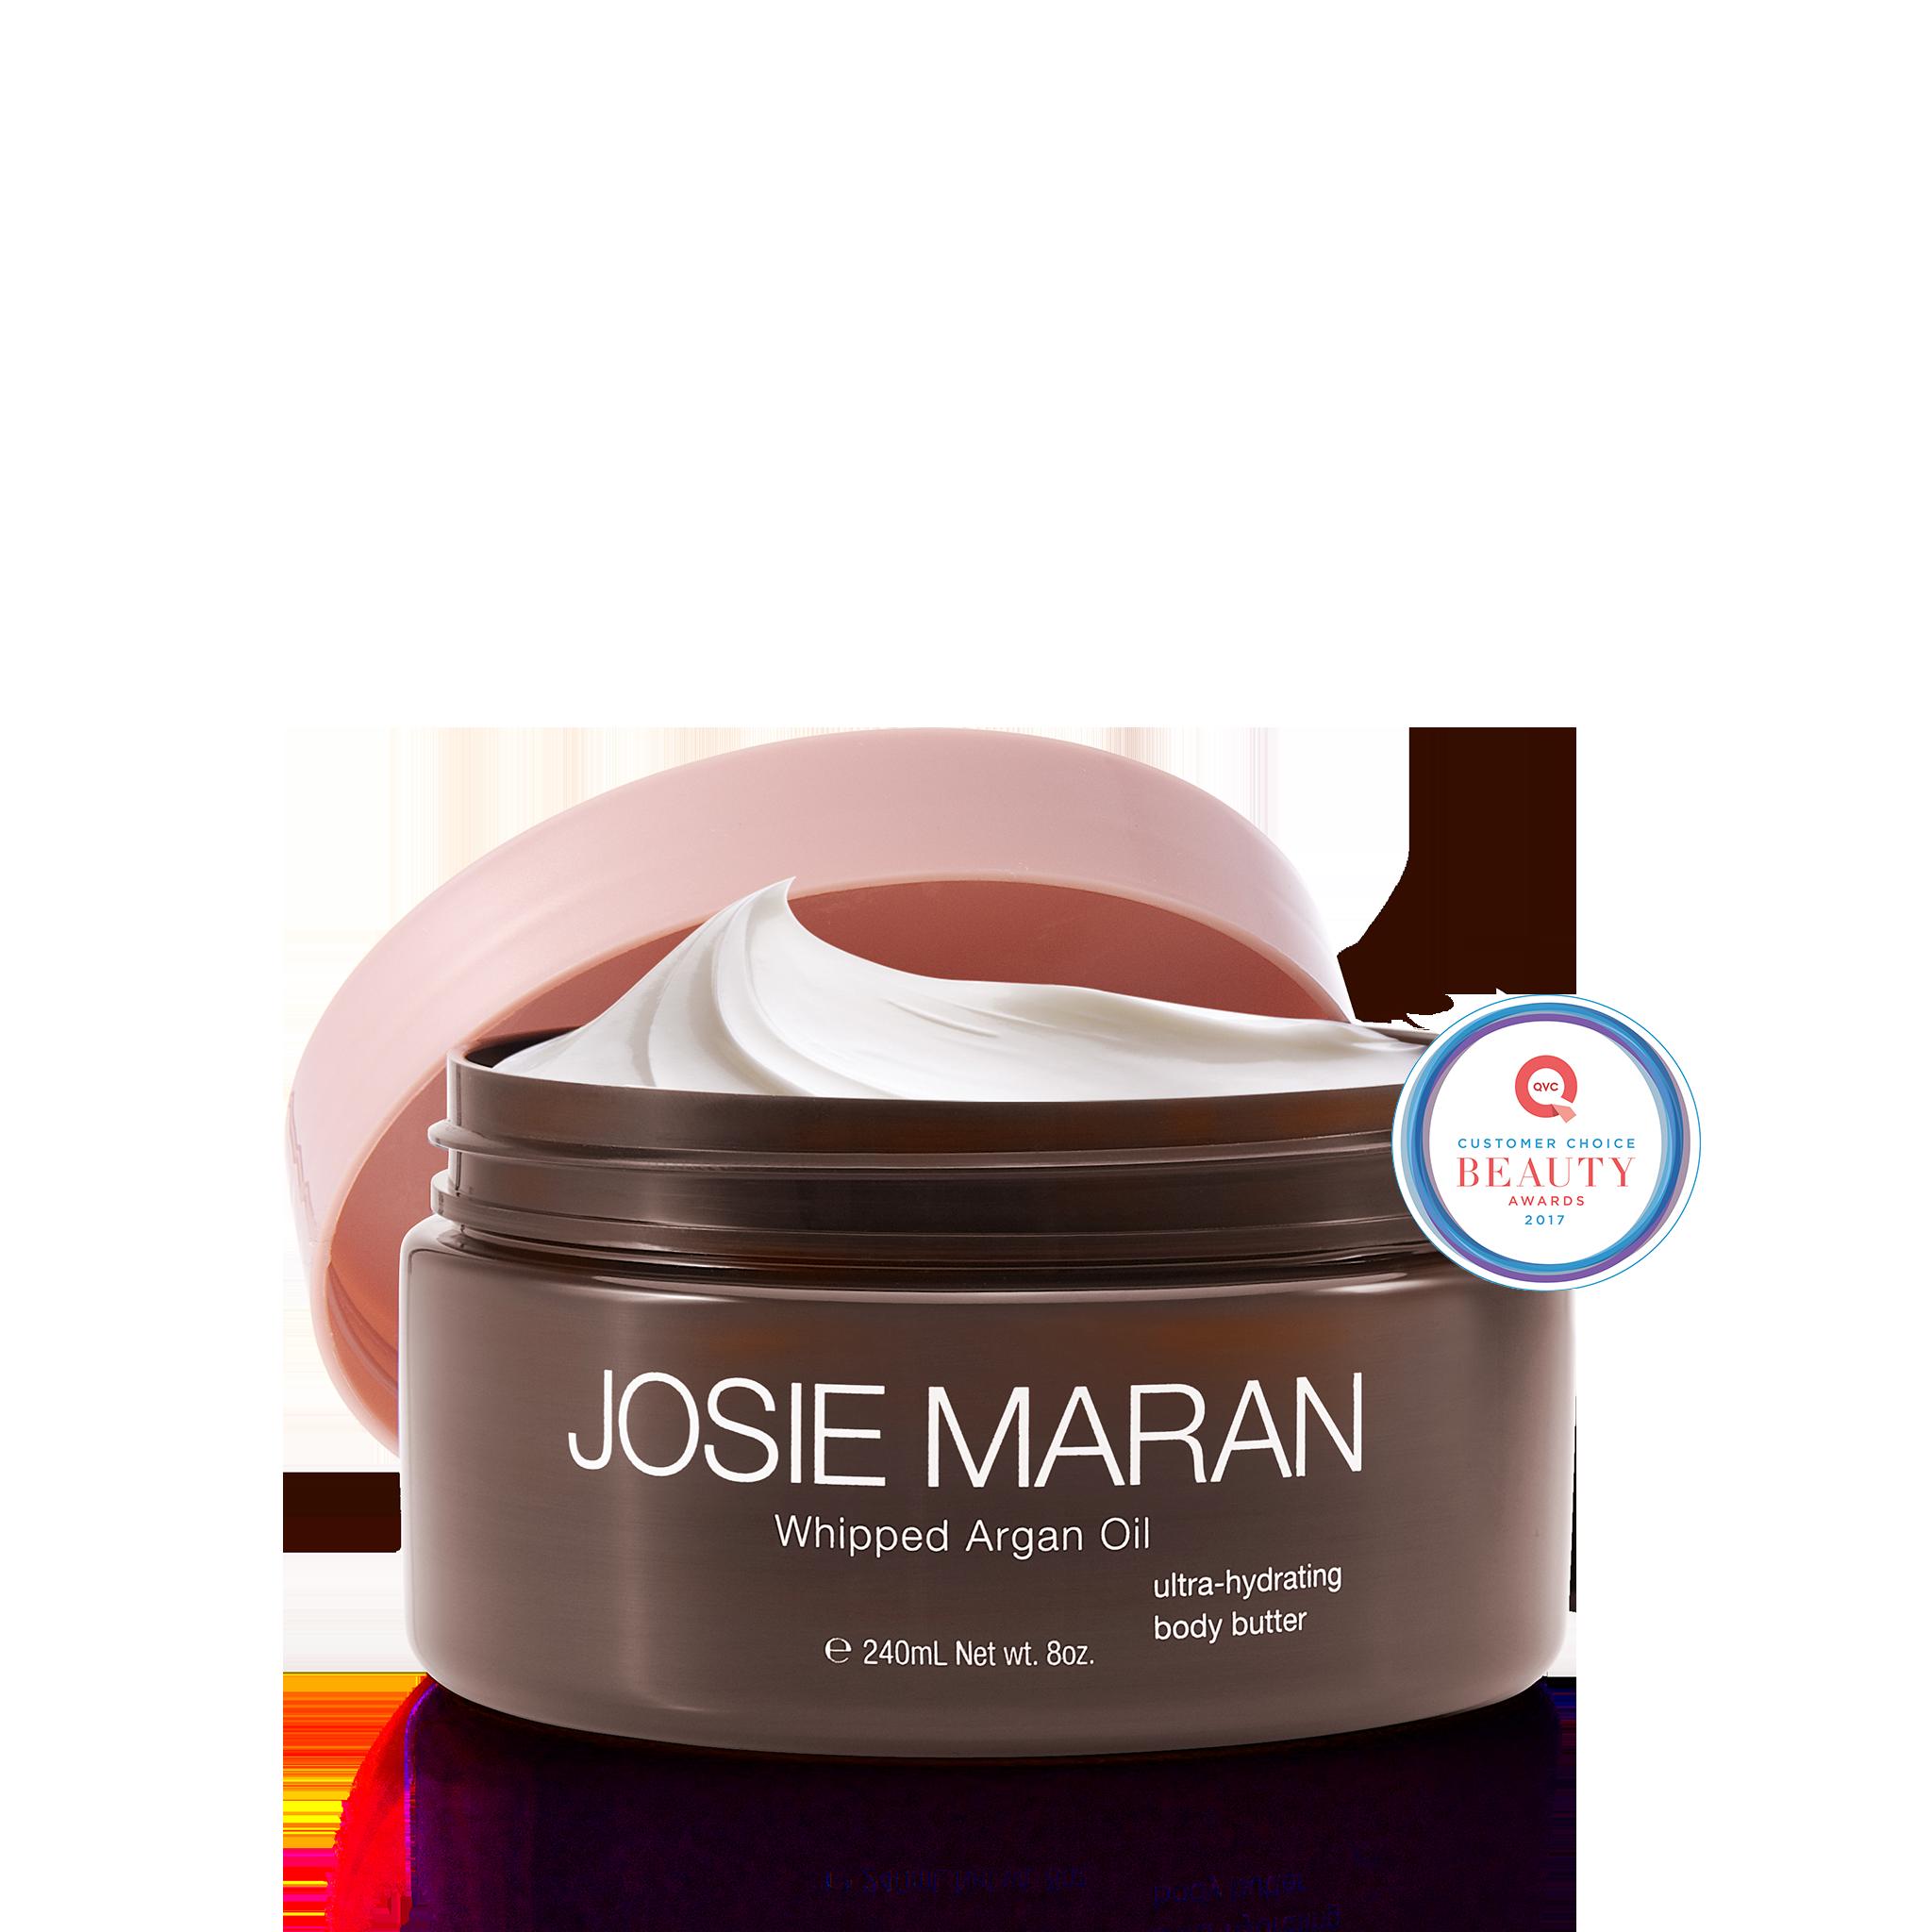 Josie Maran Whipped Argan Oil Body Butter Vanilla Bean